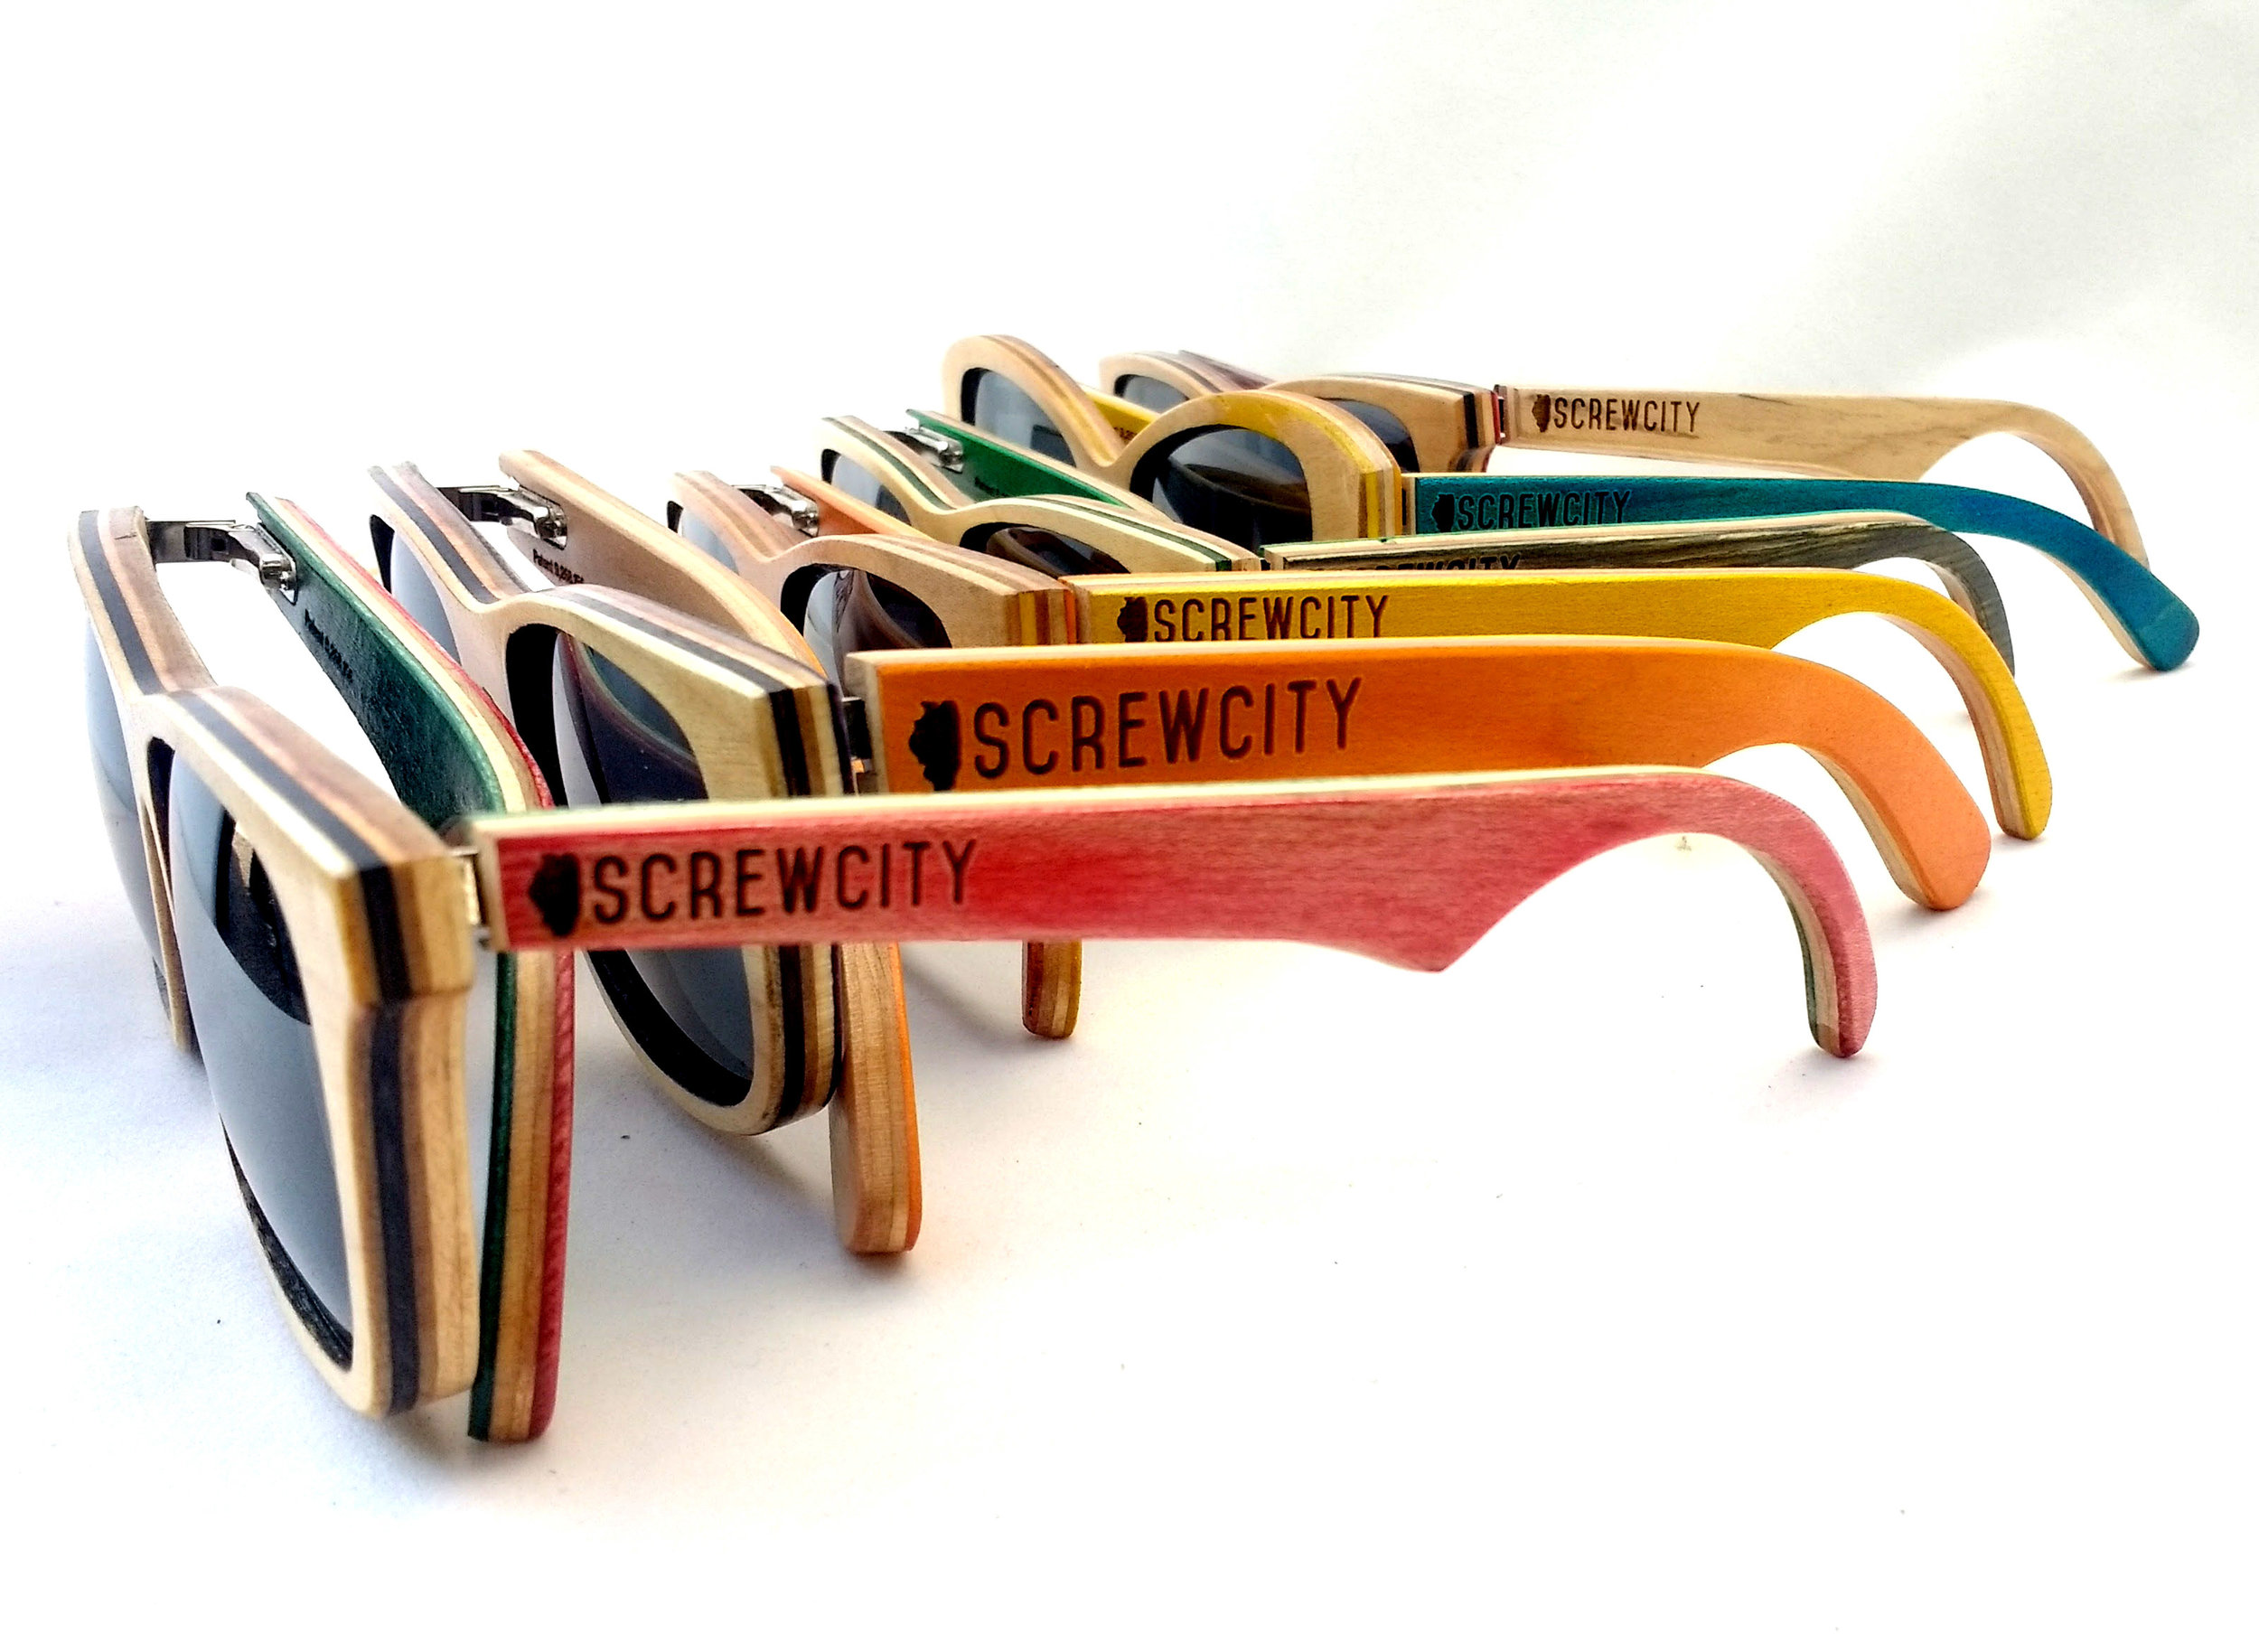 Rainbow of Screw City SK8Glasses™ with logos